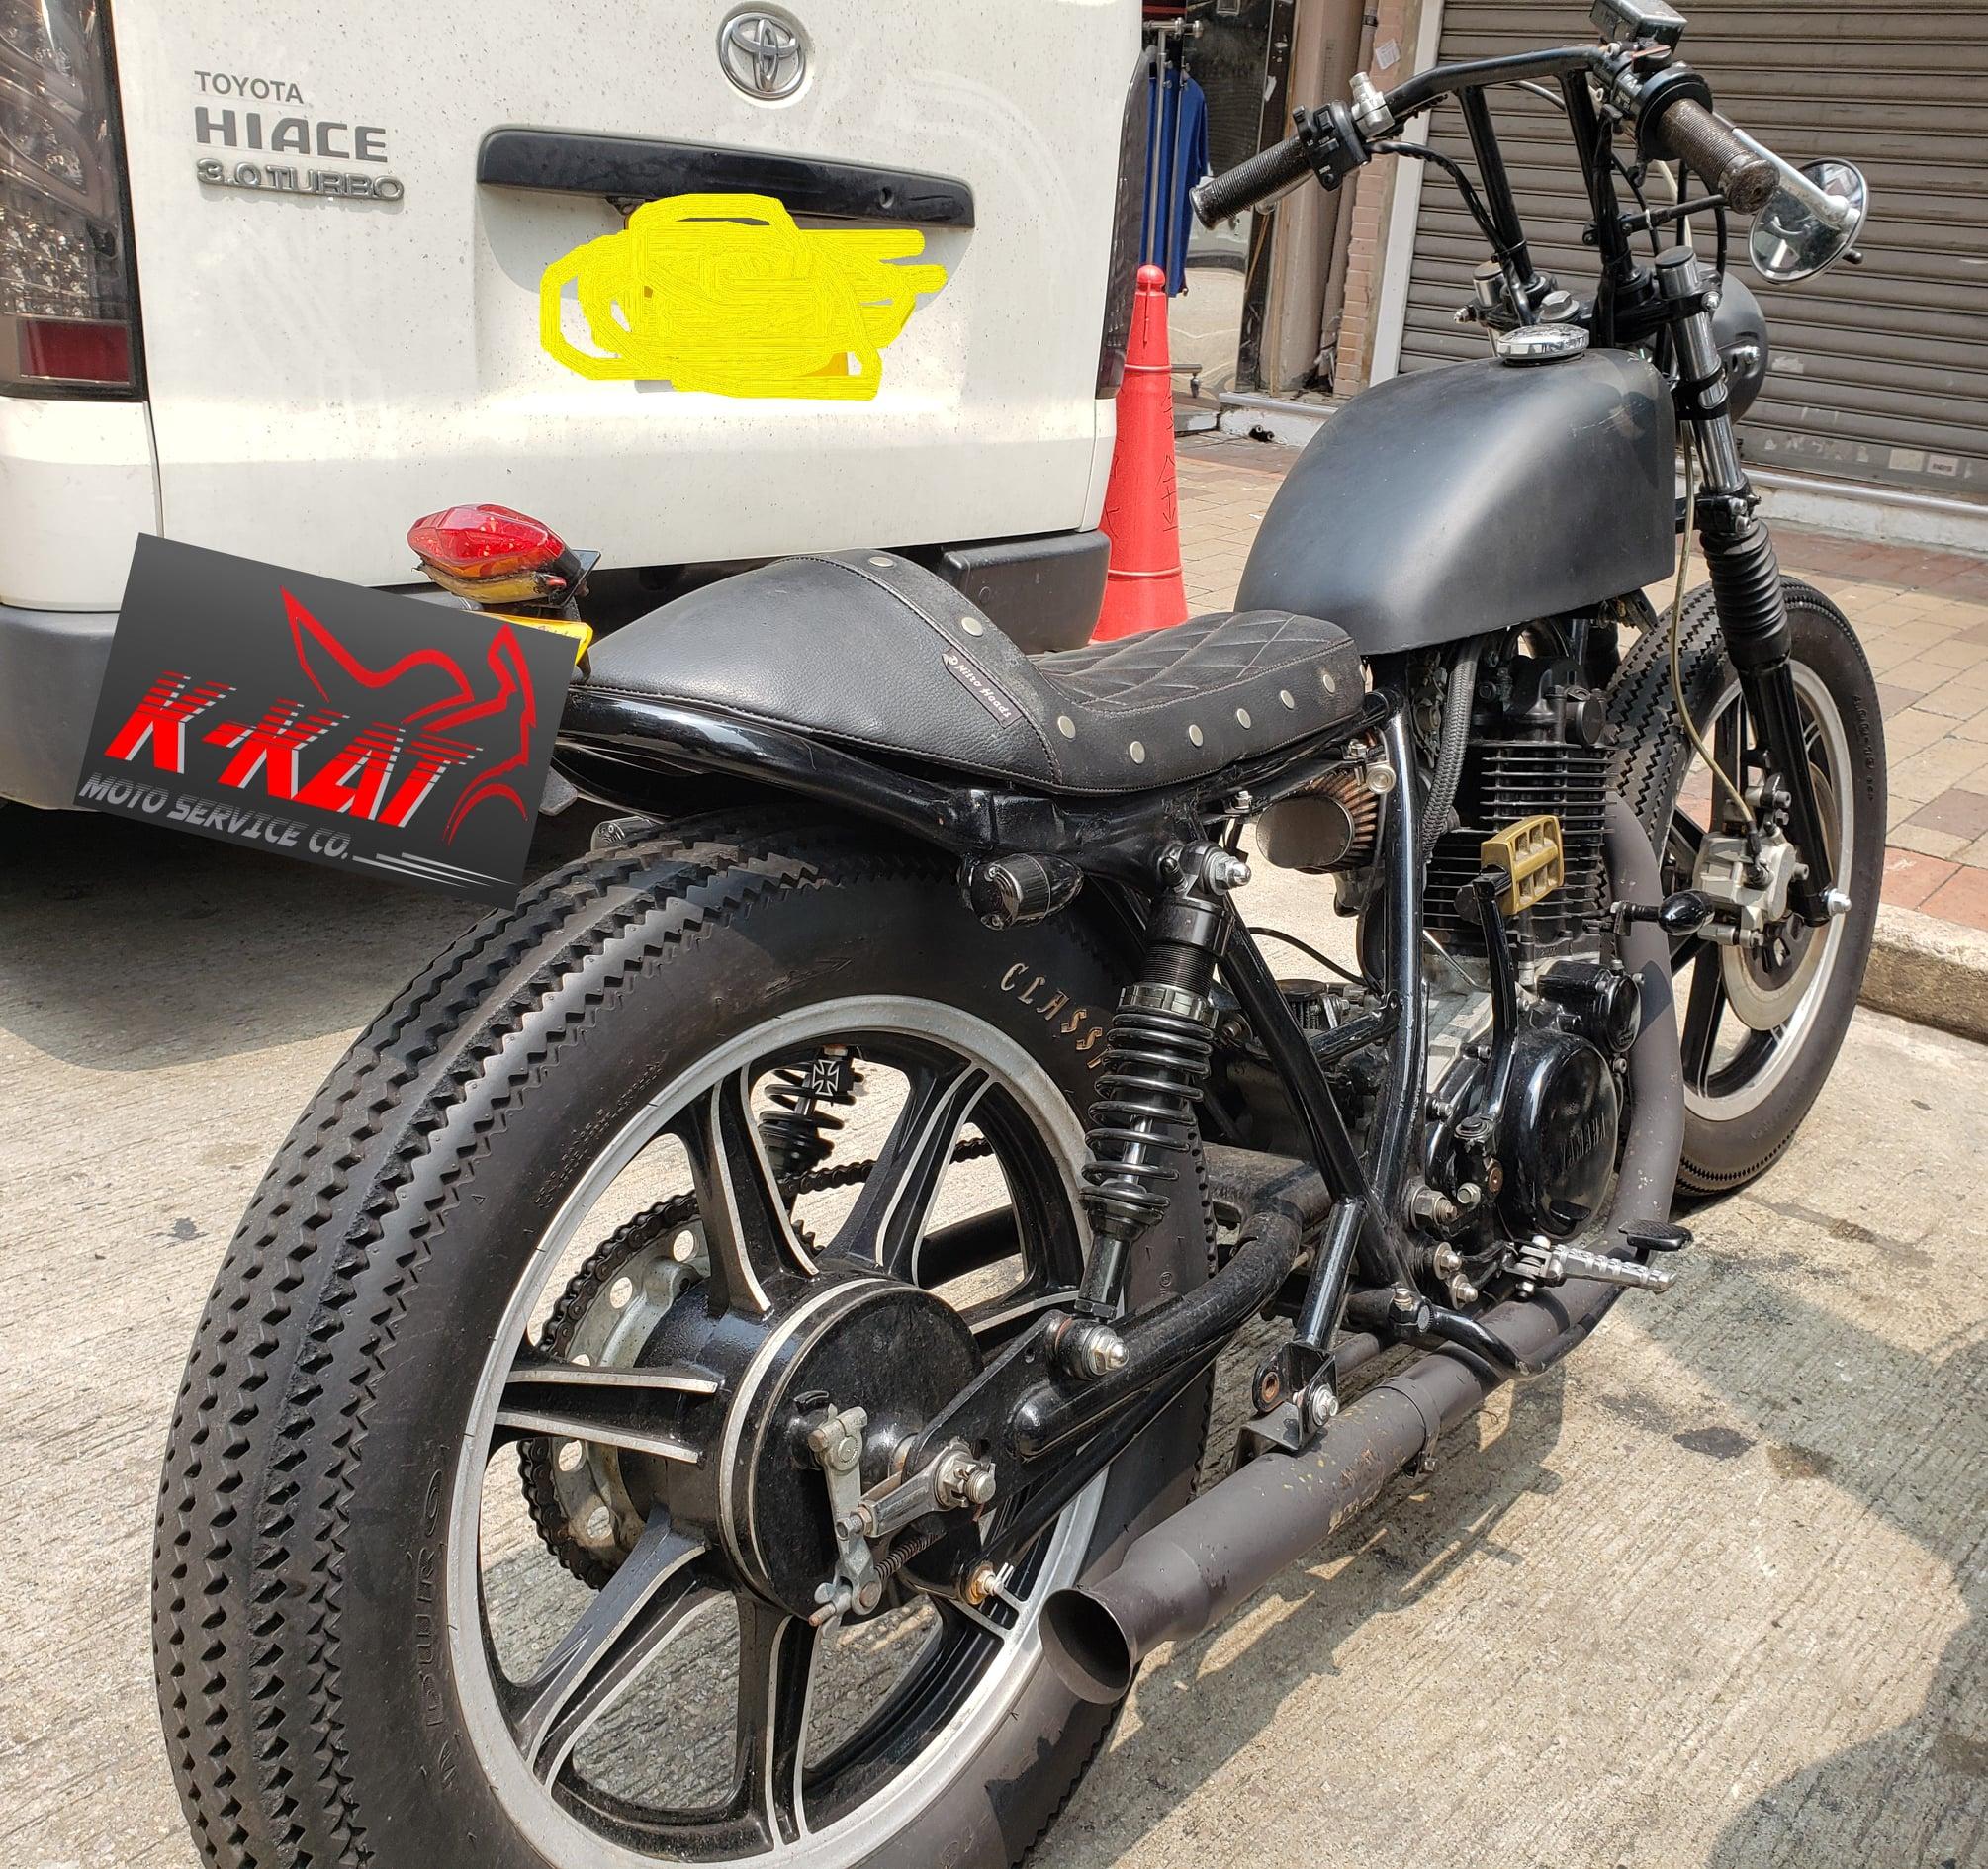 【K-KAT MOTO SERVICE CO.】 YAMAHA SR400 二手車 1994年 - 「Webike摩托車市」